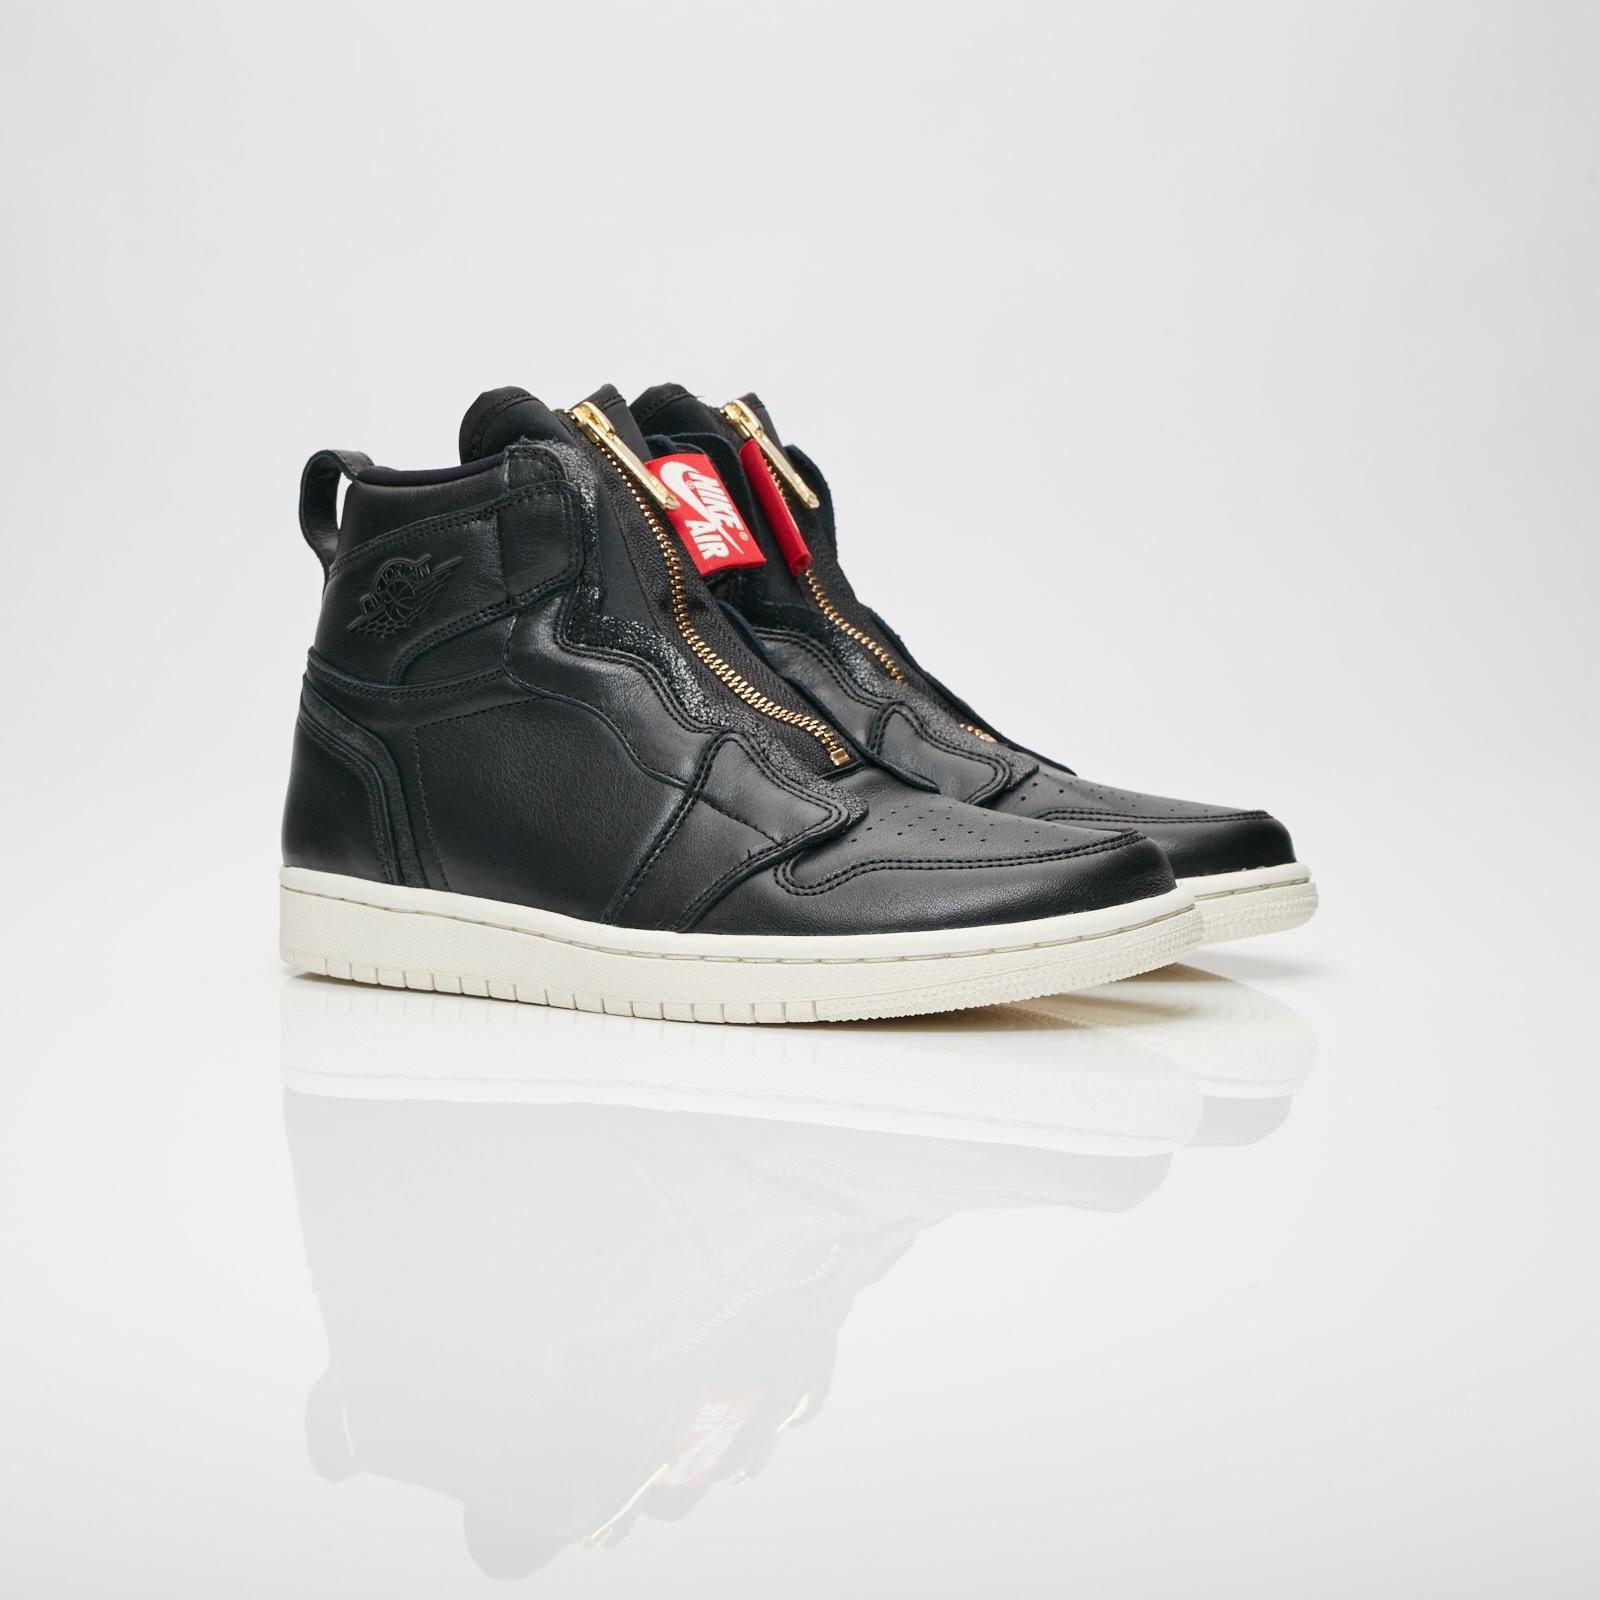 Brand Jordan Wmns Air Jordan 1 High Zip